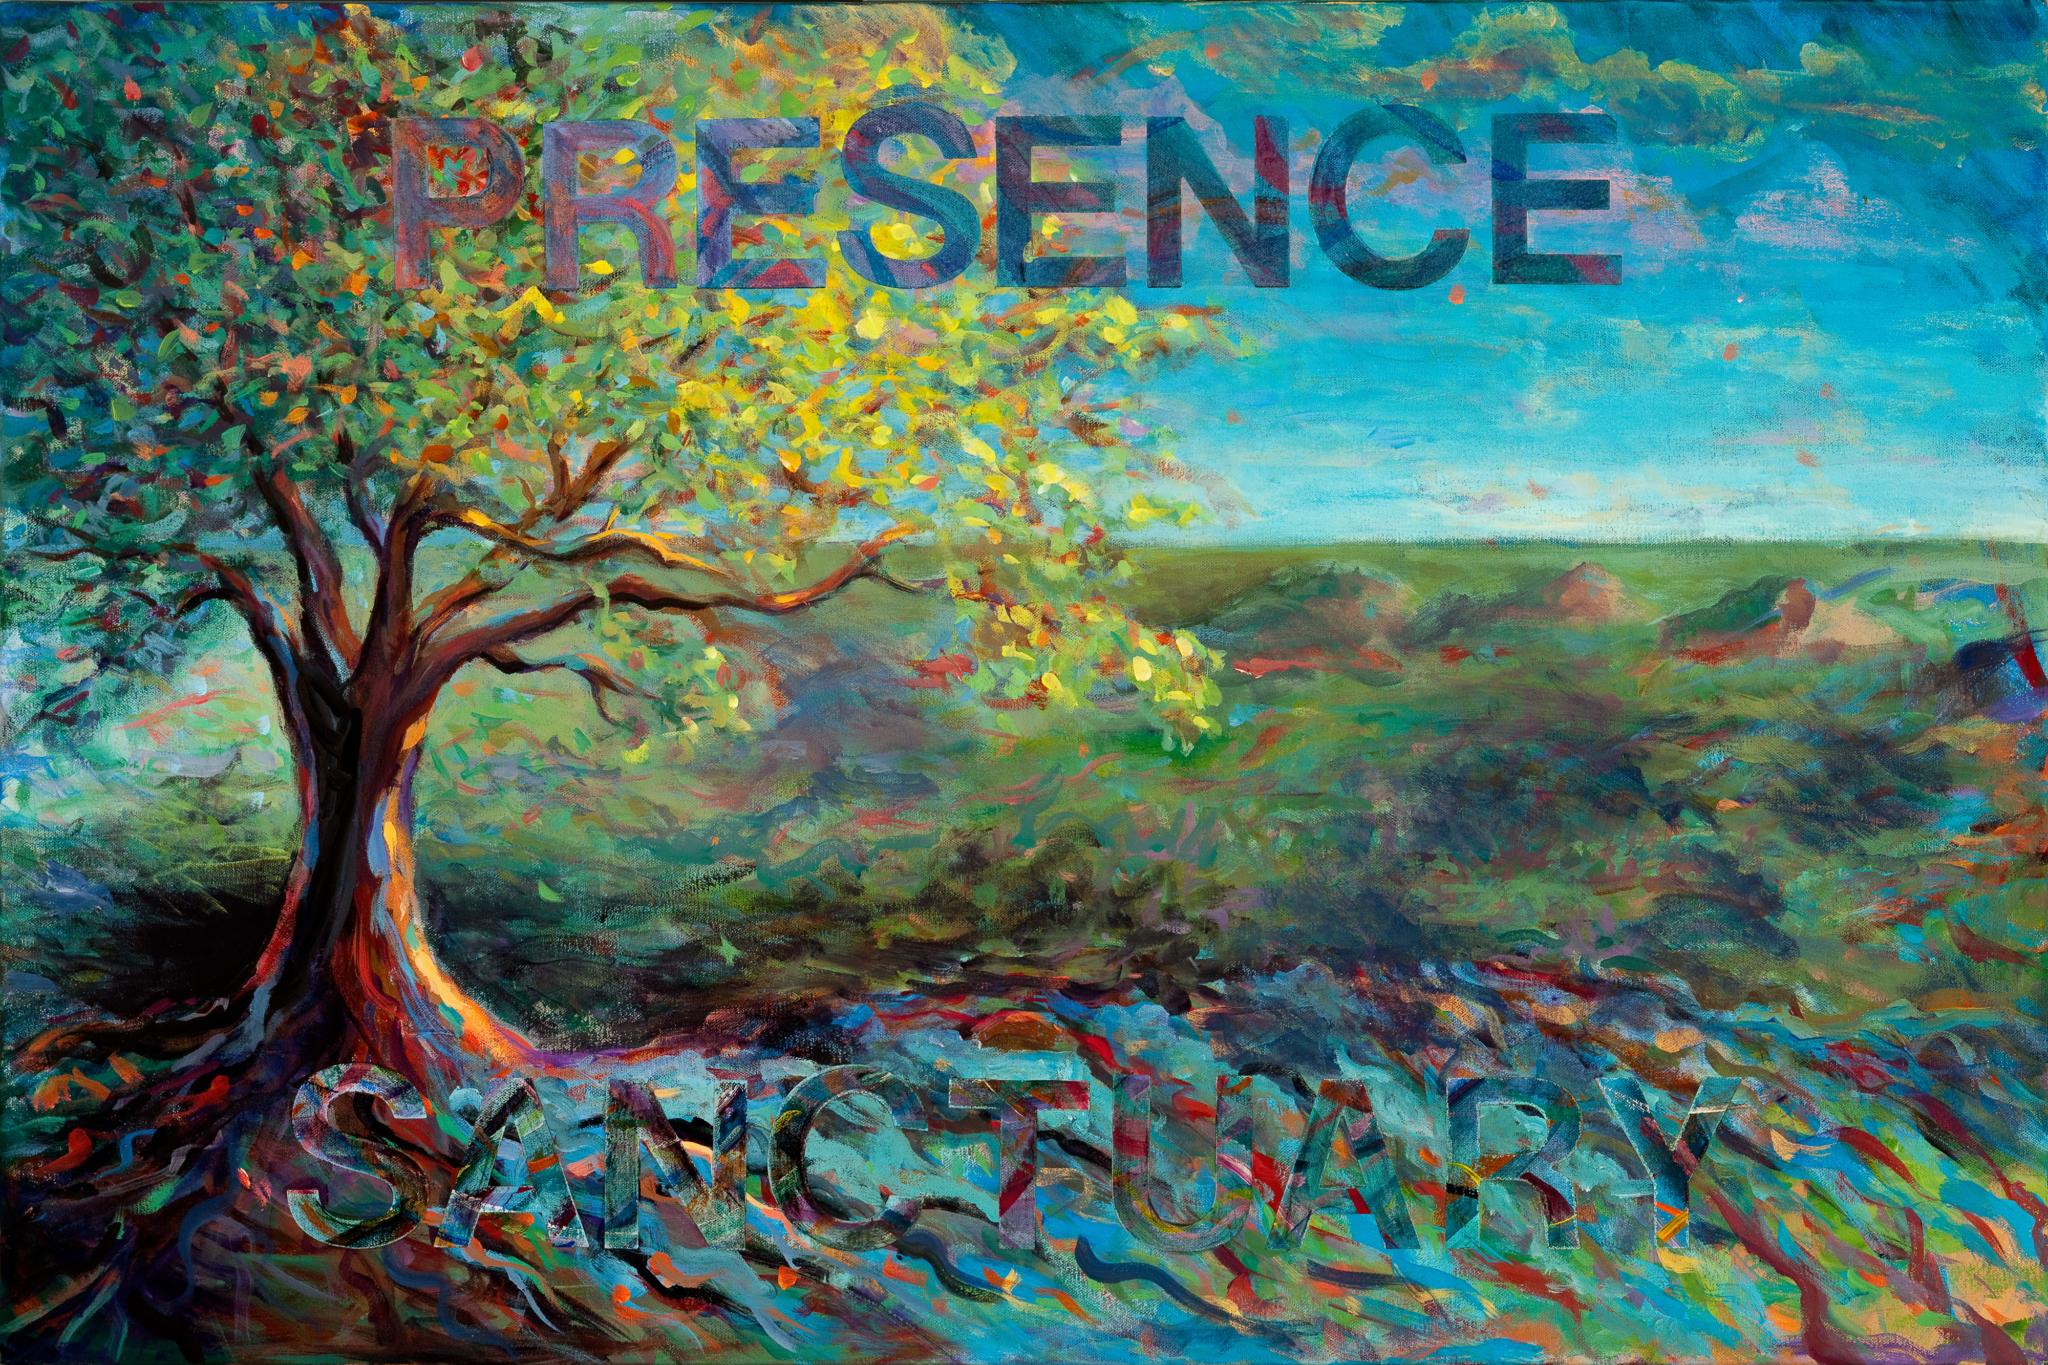 Presence - Latimer Bowen